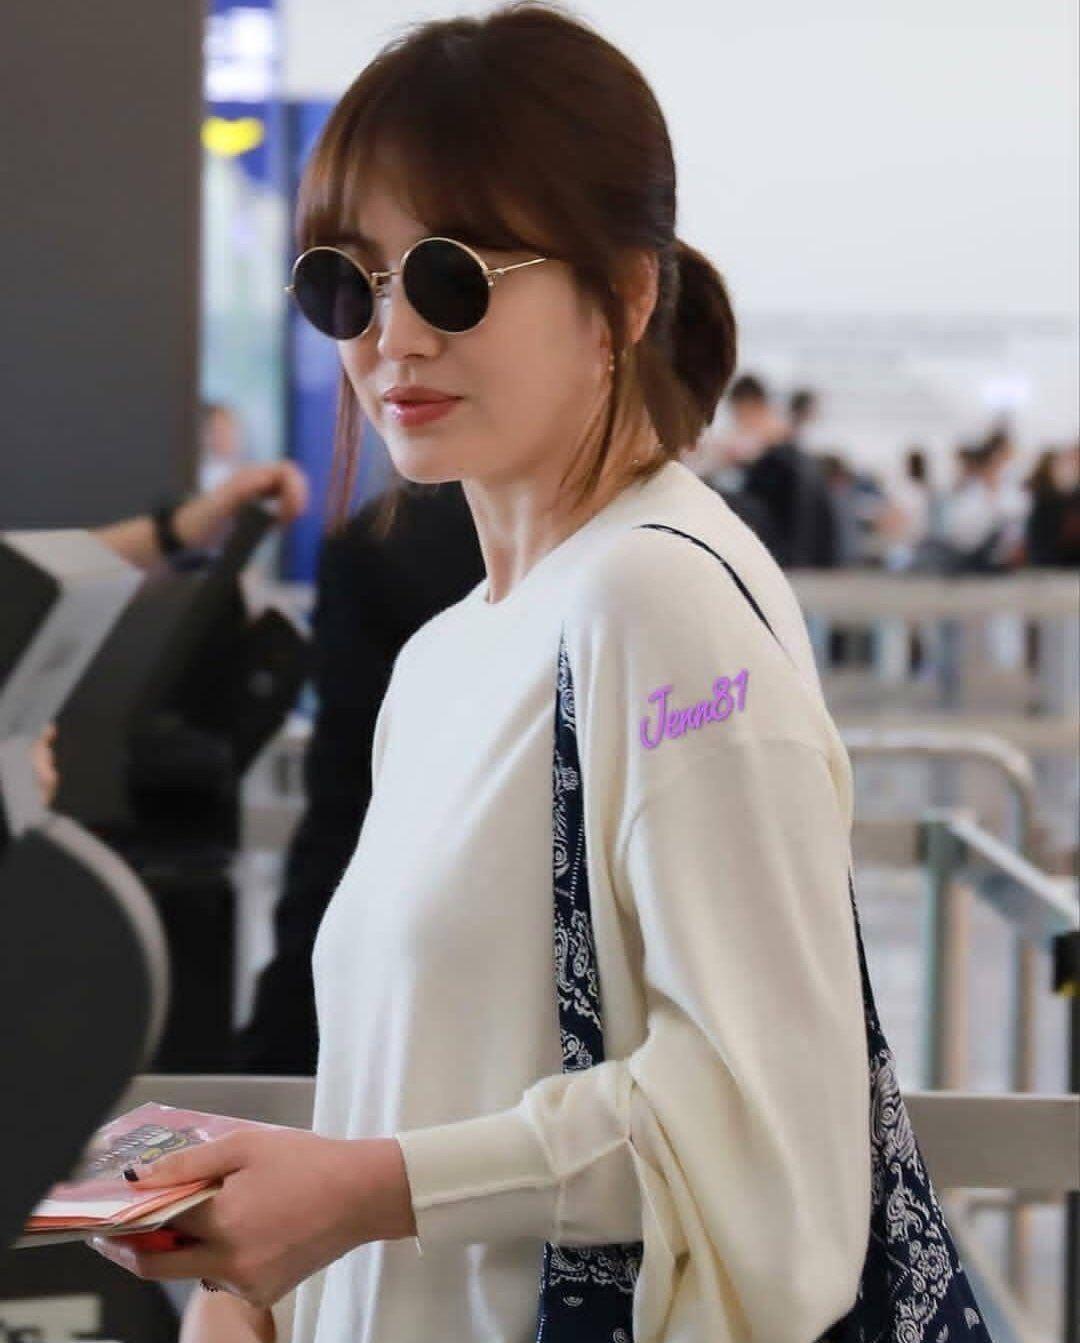 Song hye kyo 2018 | Selebritas